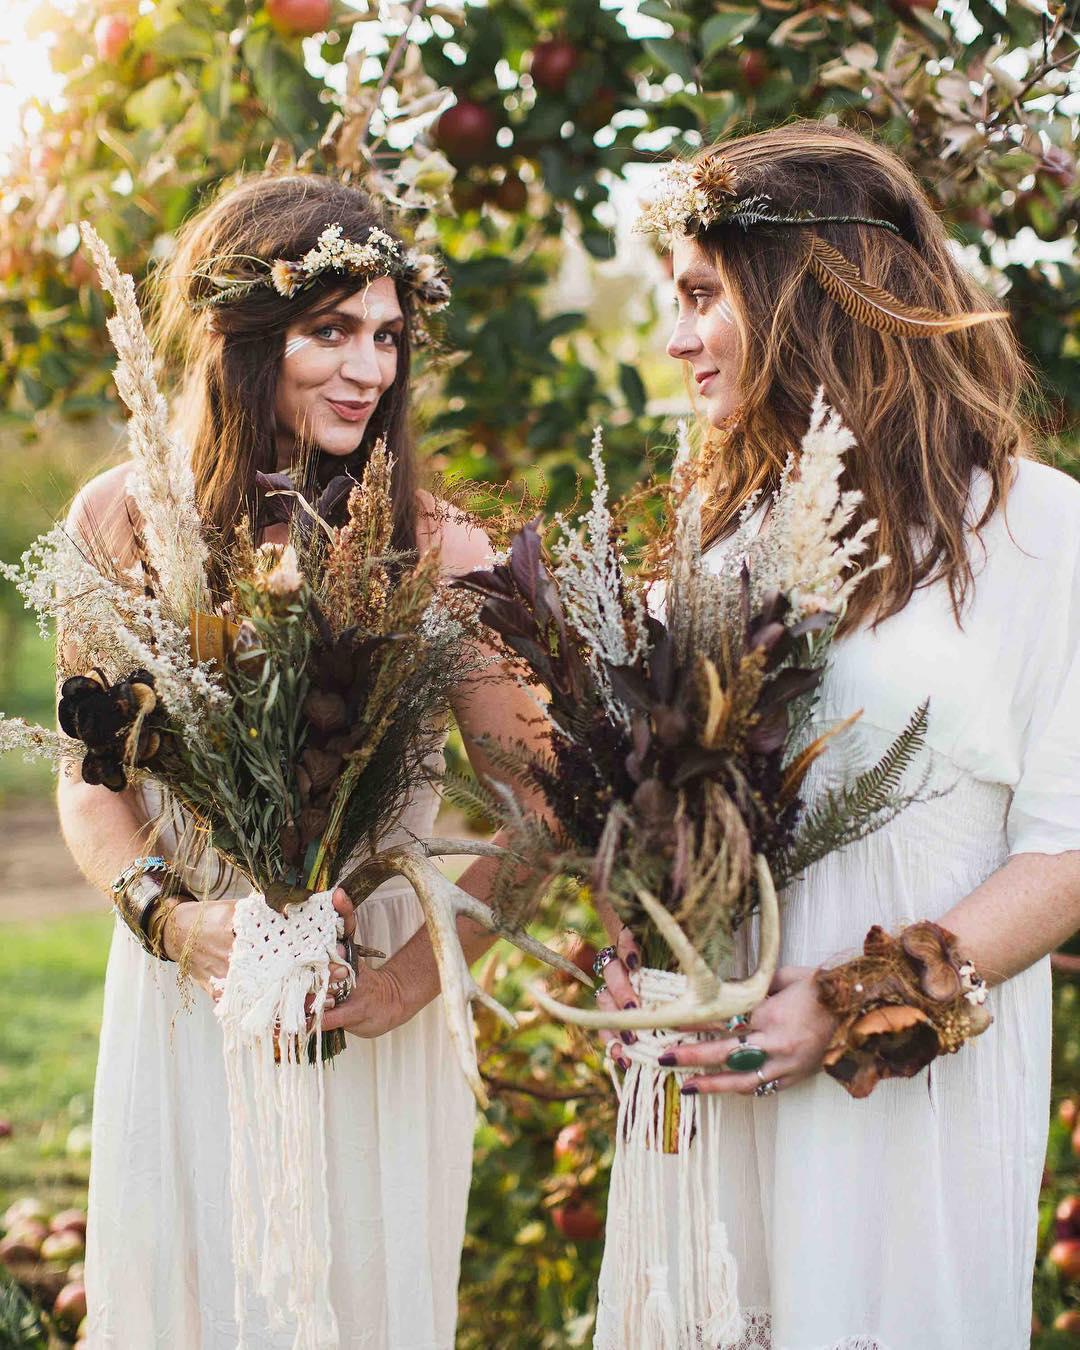 these girls…I can't even❤️🍂🌿🍁 photo | @erikafollansbee . . #naturalbeauty #lovely #eve #herandher #weddinginspo #lifeinspo #beyourself #tellyourstory #lovethis #lovelies #loveconquersall #bohostyle #bohobride #macrame